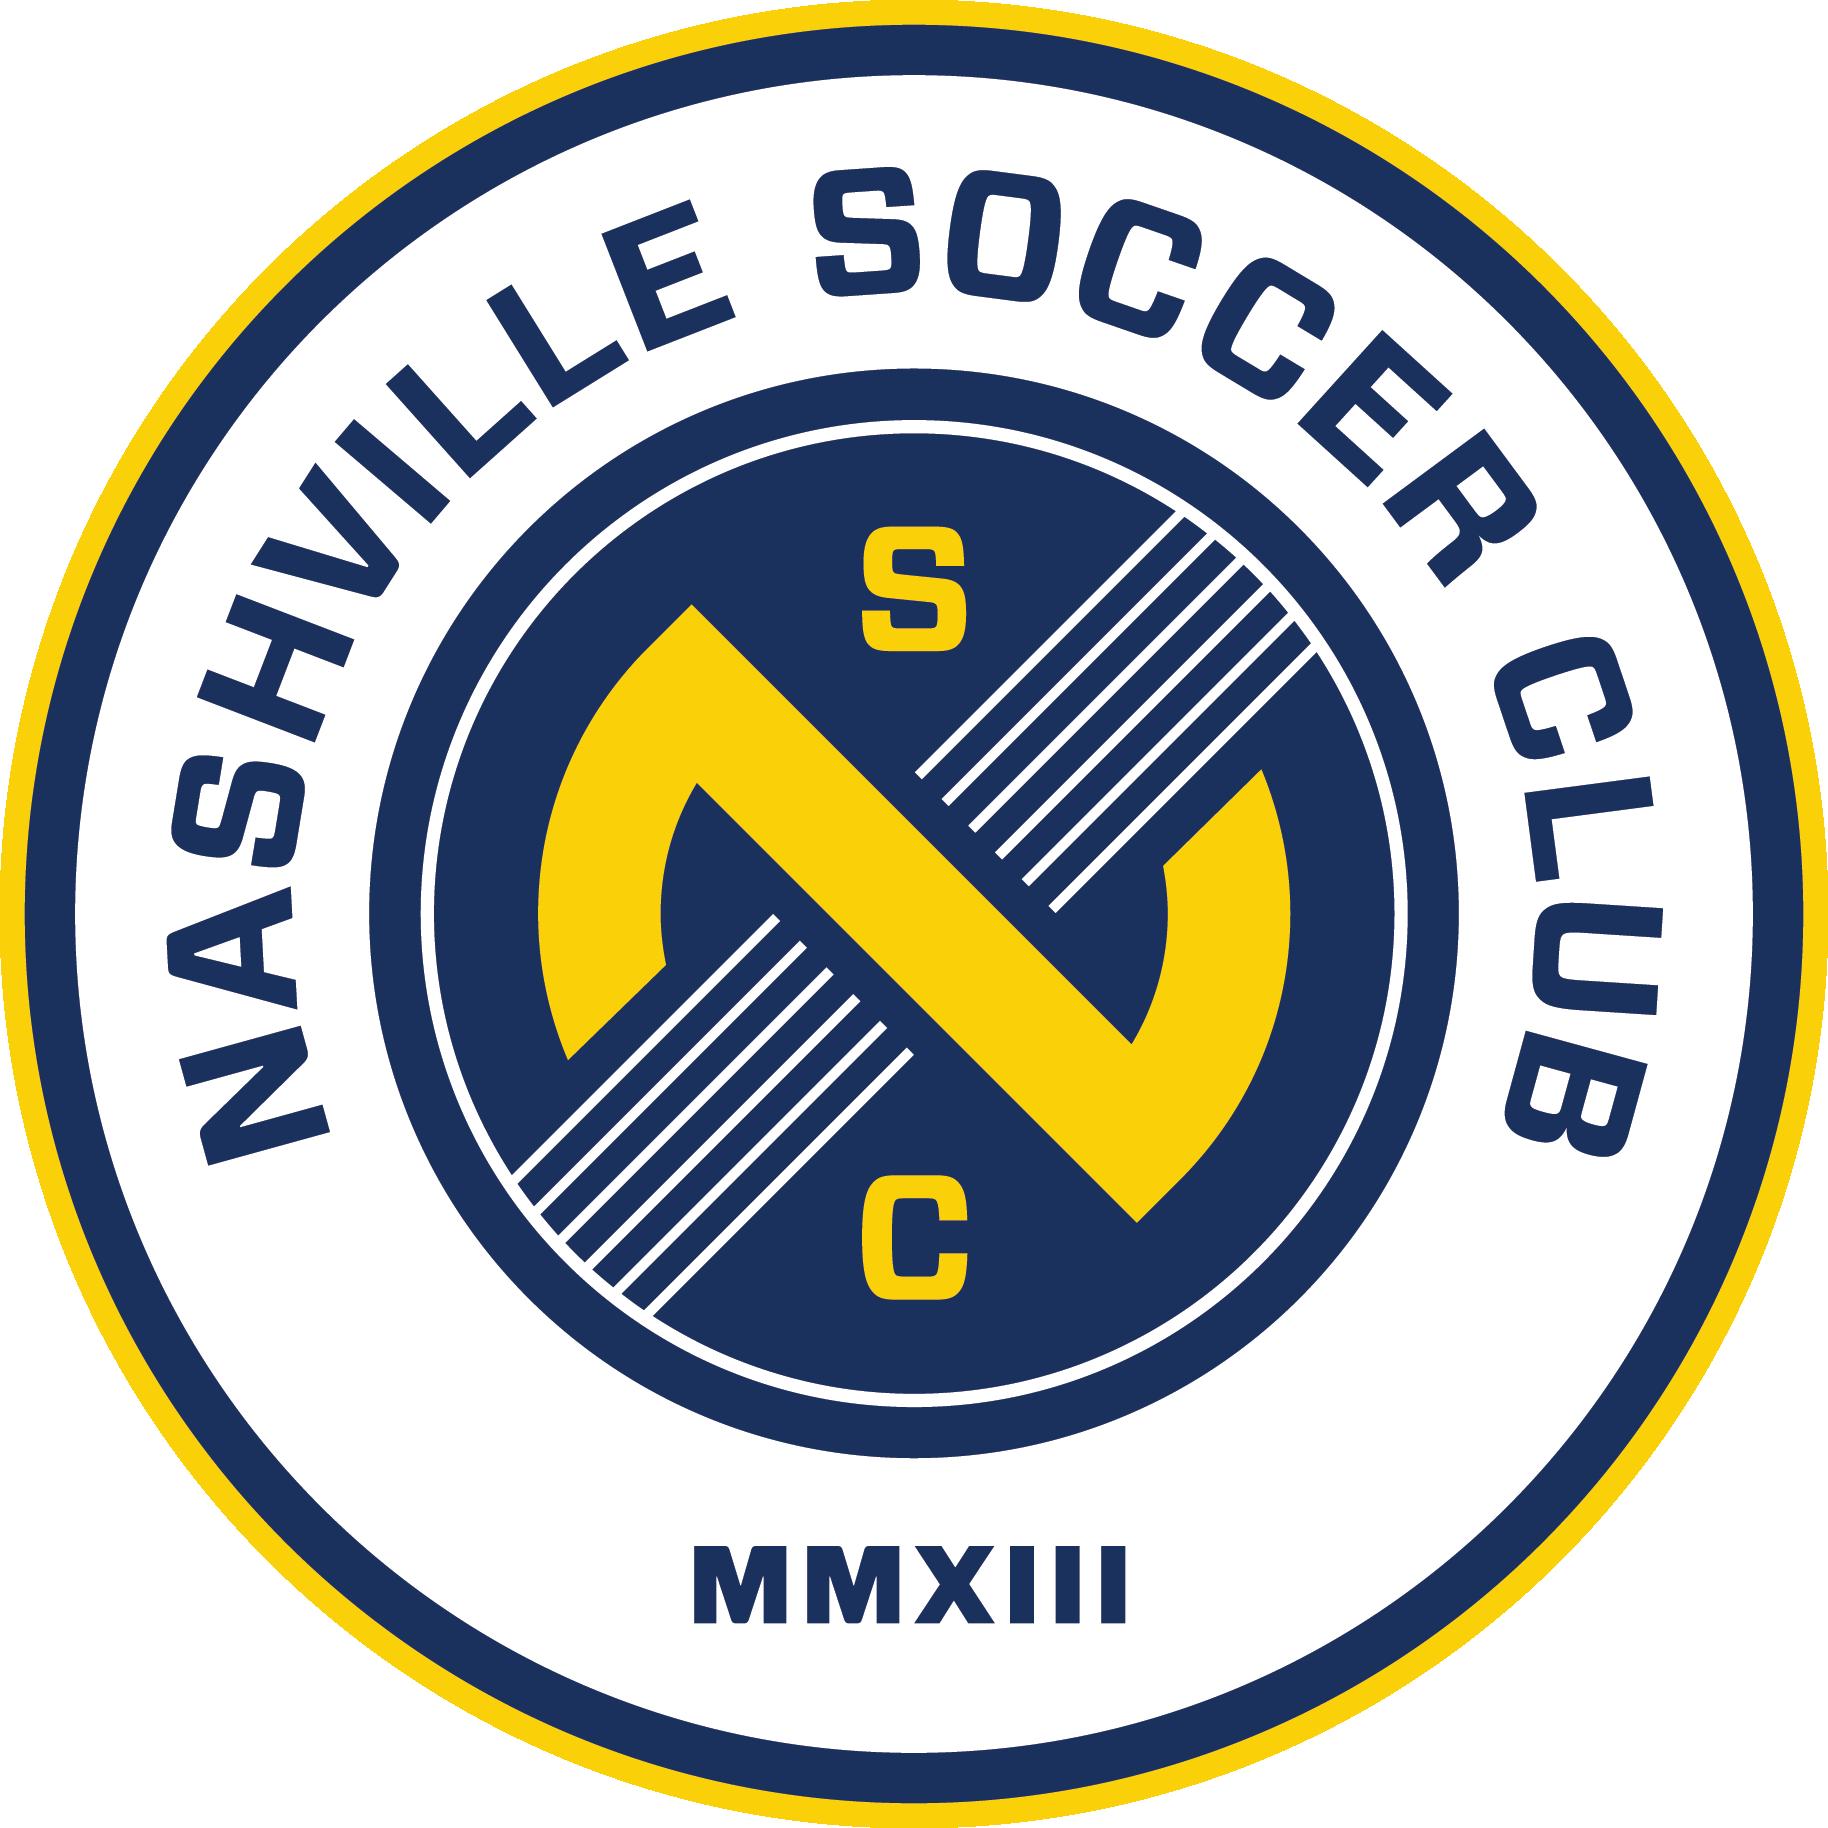 Mayor Barry Announces Stadium Plans for Nashville Soccer Club